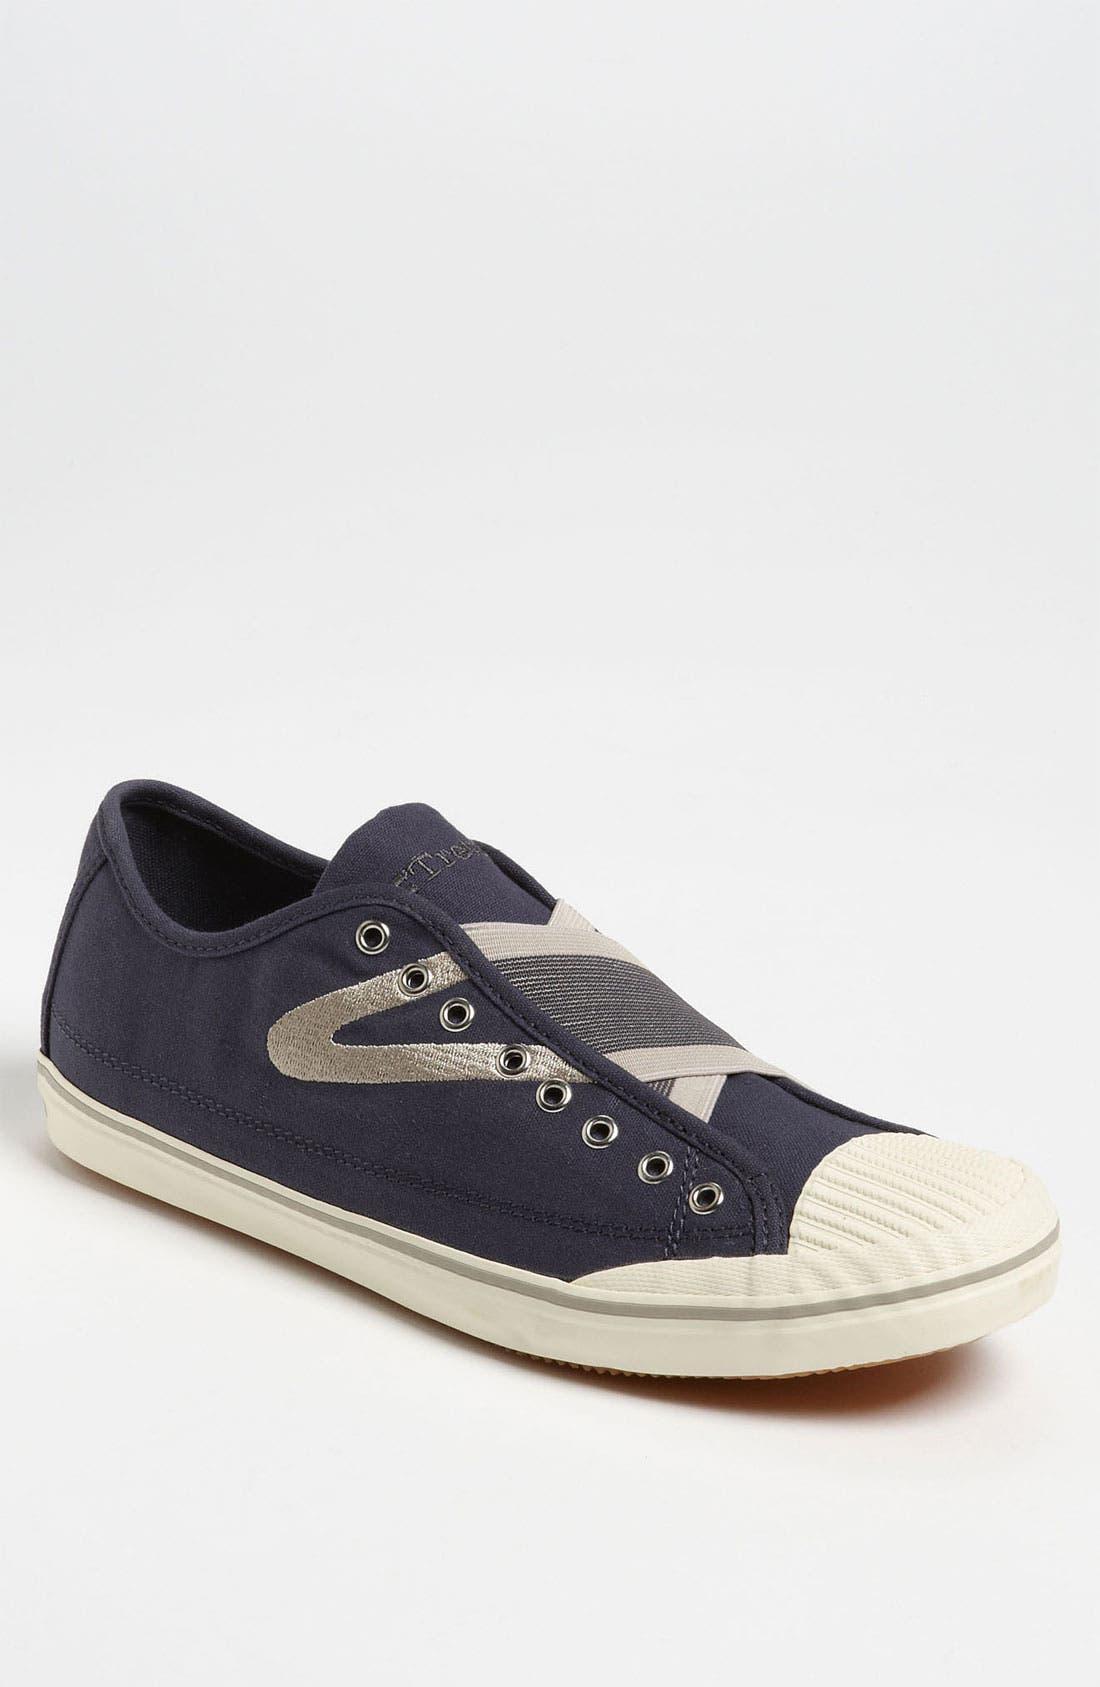 Alternate Image 1 Selected - Tretorn 'Skymra' Sneaker